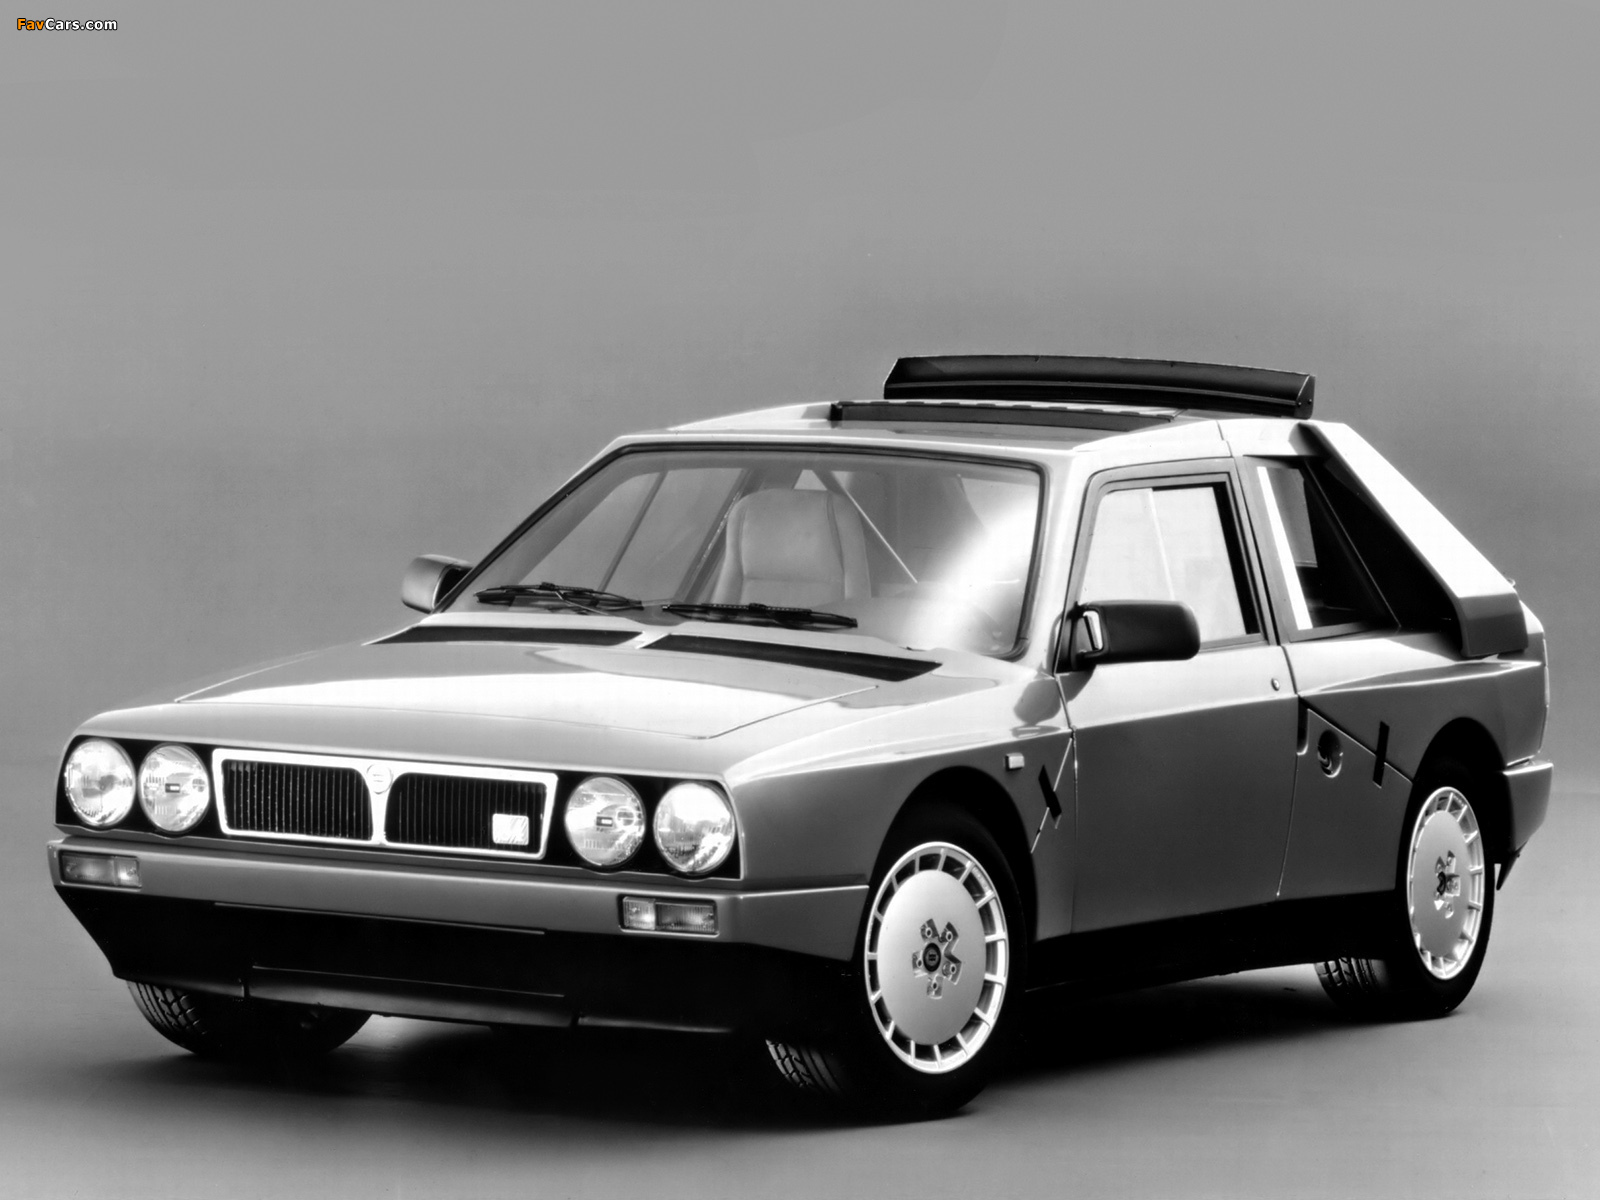 Photos Of Lancia Delta S4 Stradale Se038 1985 1986